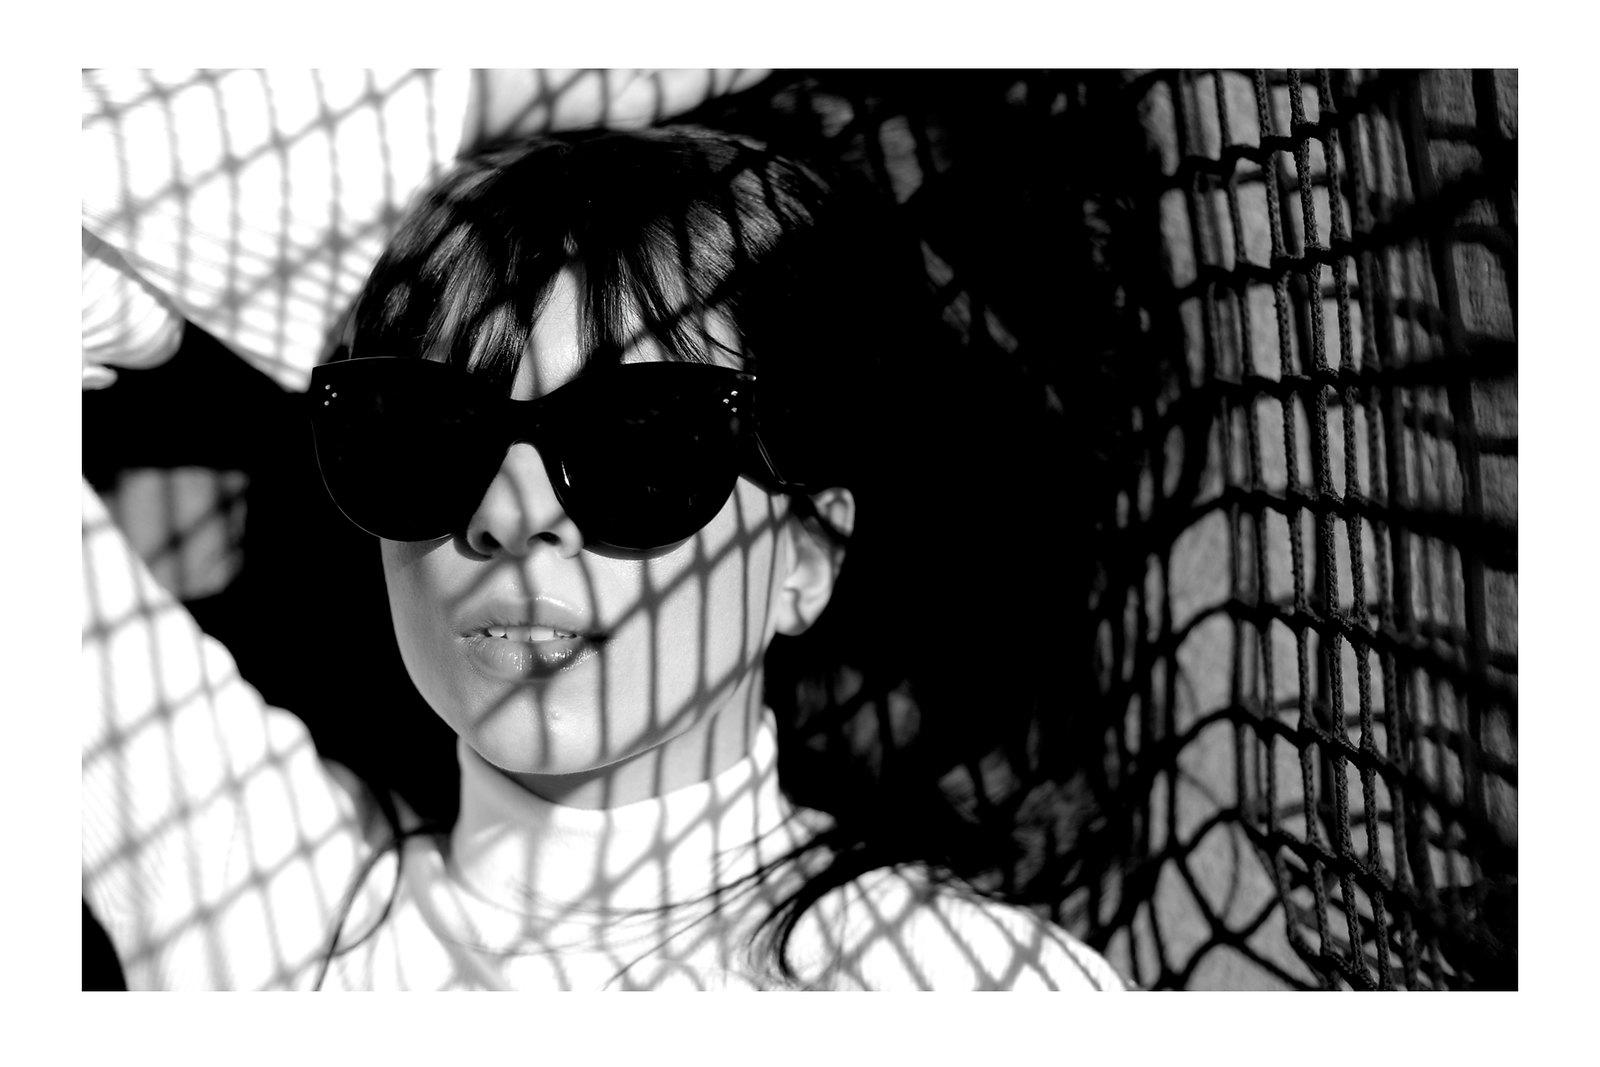 tennis edgy styling editorial photography chicwish white knit bell sleeves silk pants summer heat style céline audrey sunglasses j.w.anderson pierce bag zara sandals shadows fashionblogger outfit ootd modeblog cats & dogs ricarda schernus düsseldorf 5